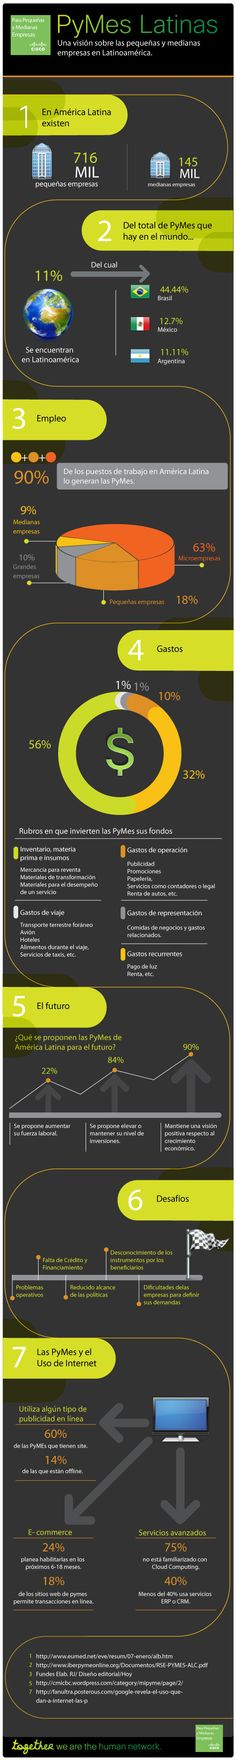 Las #PYMEs en latinoamerica (Infografia)